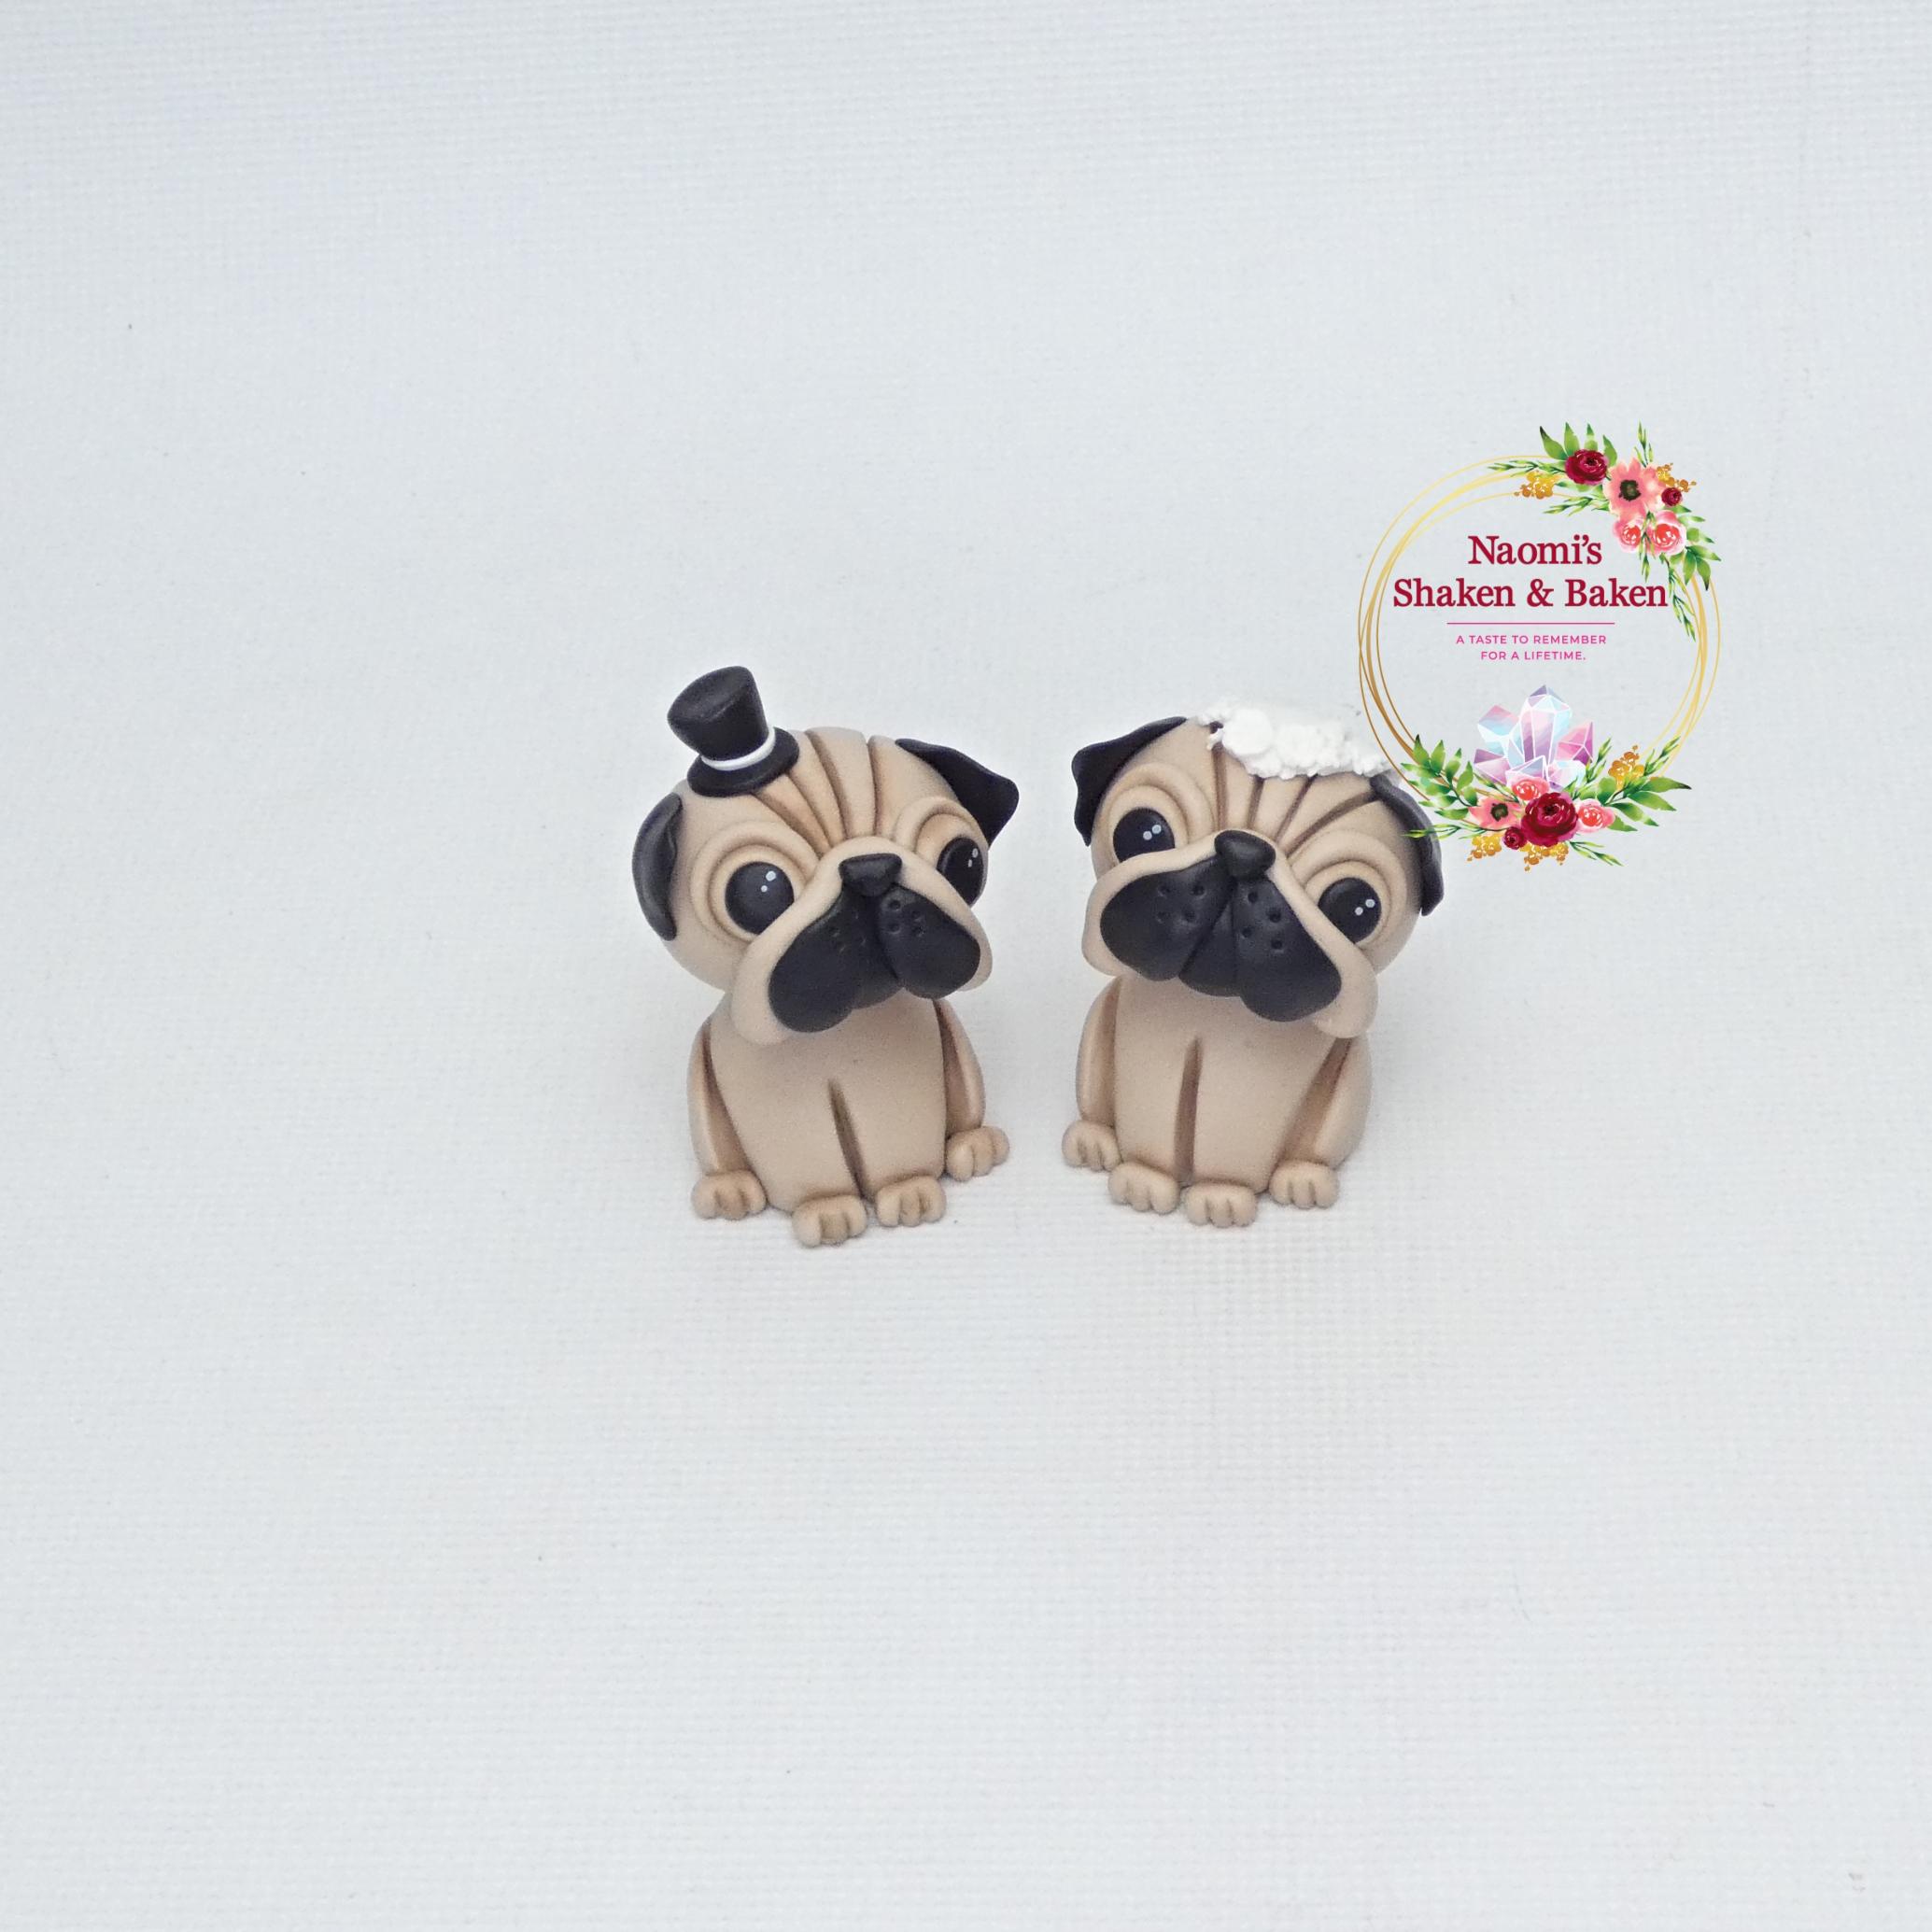 Cute Pug Dog Cake Toppers